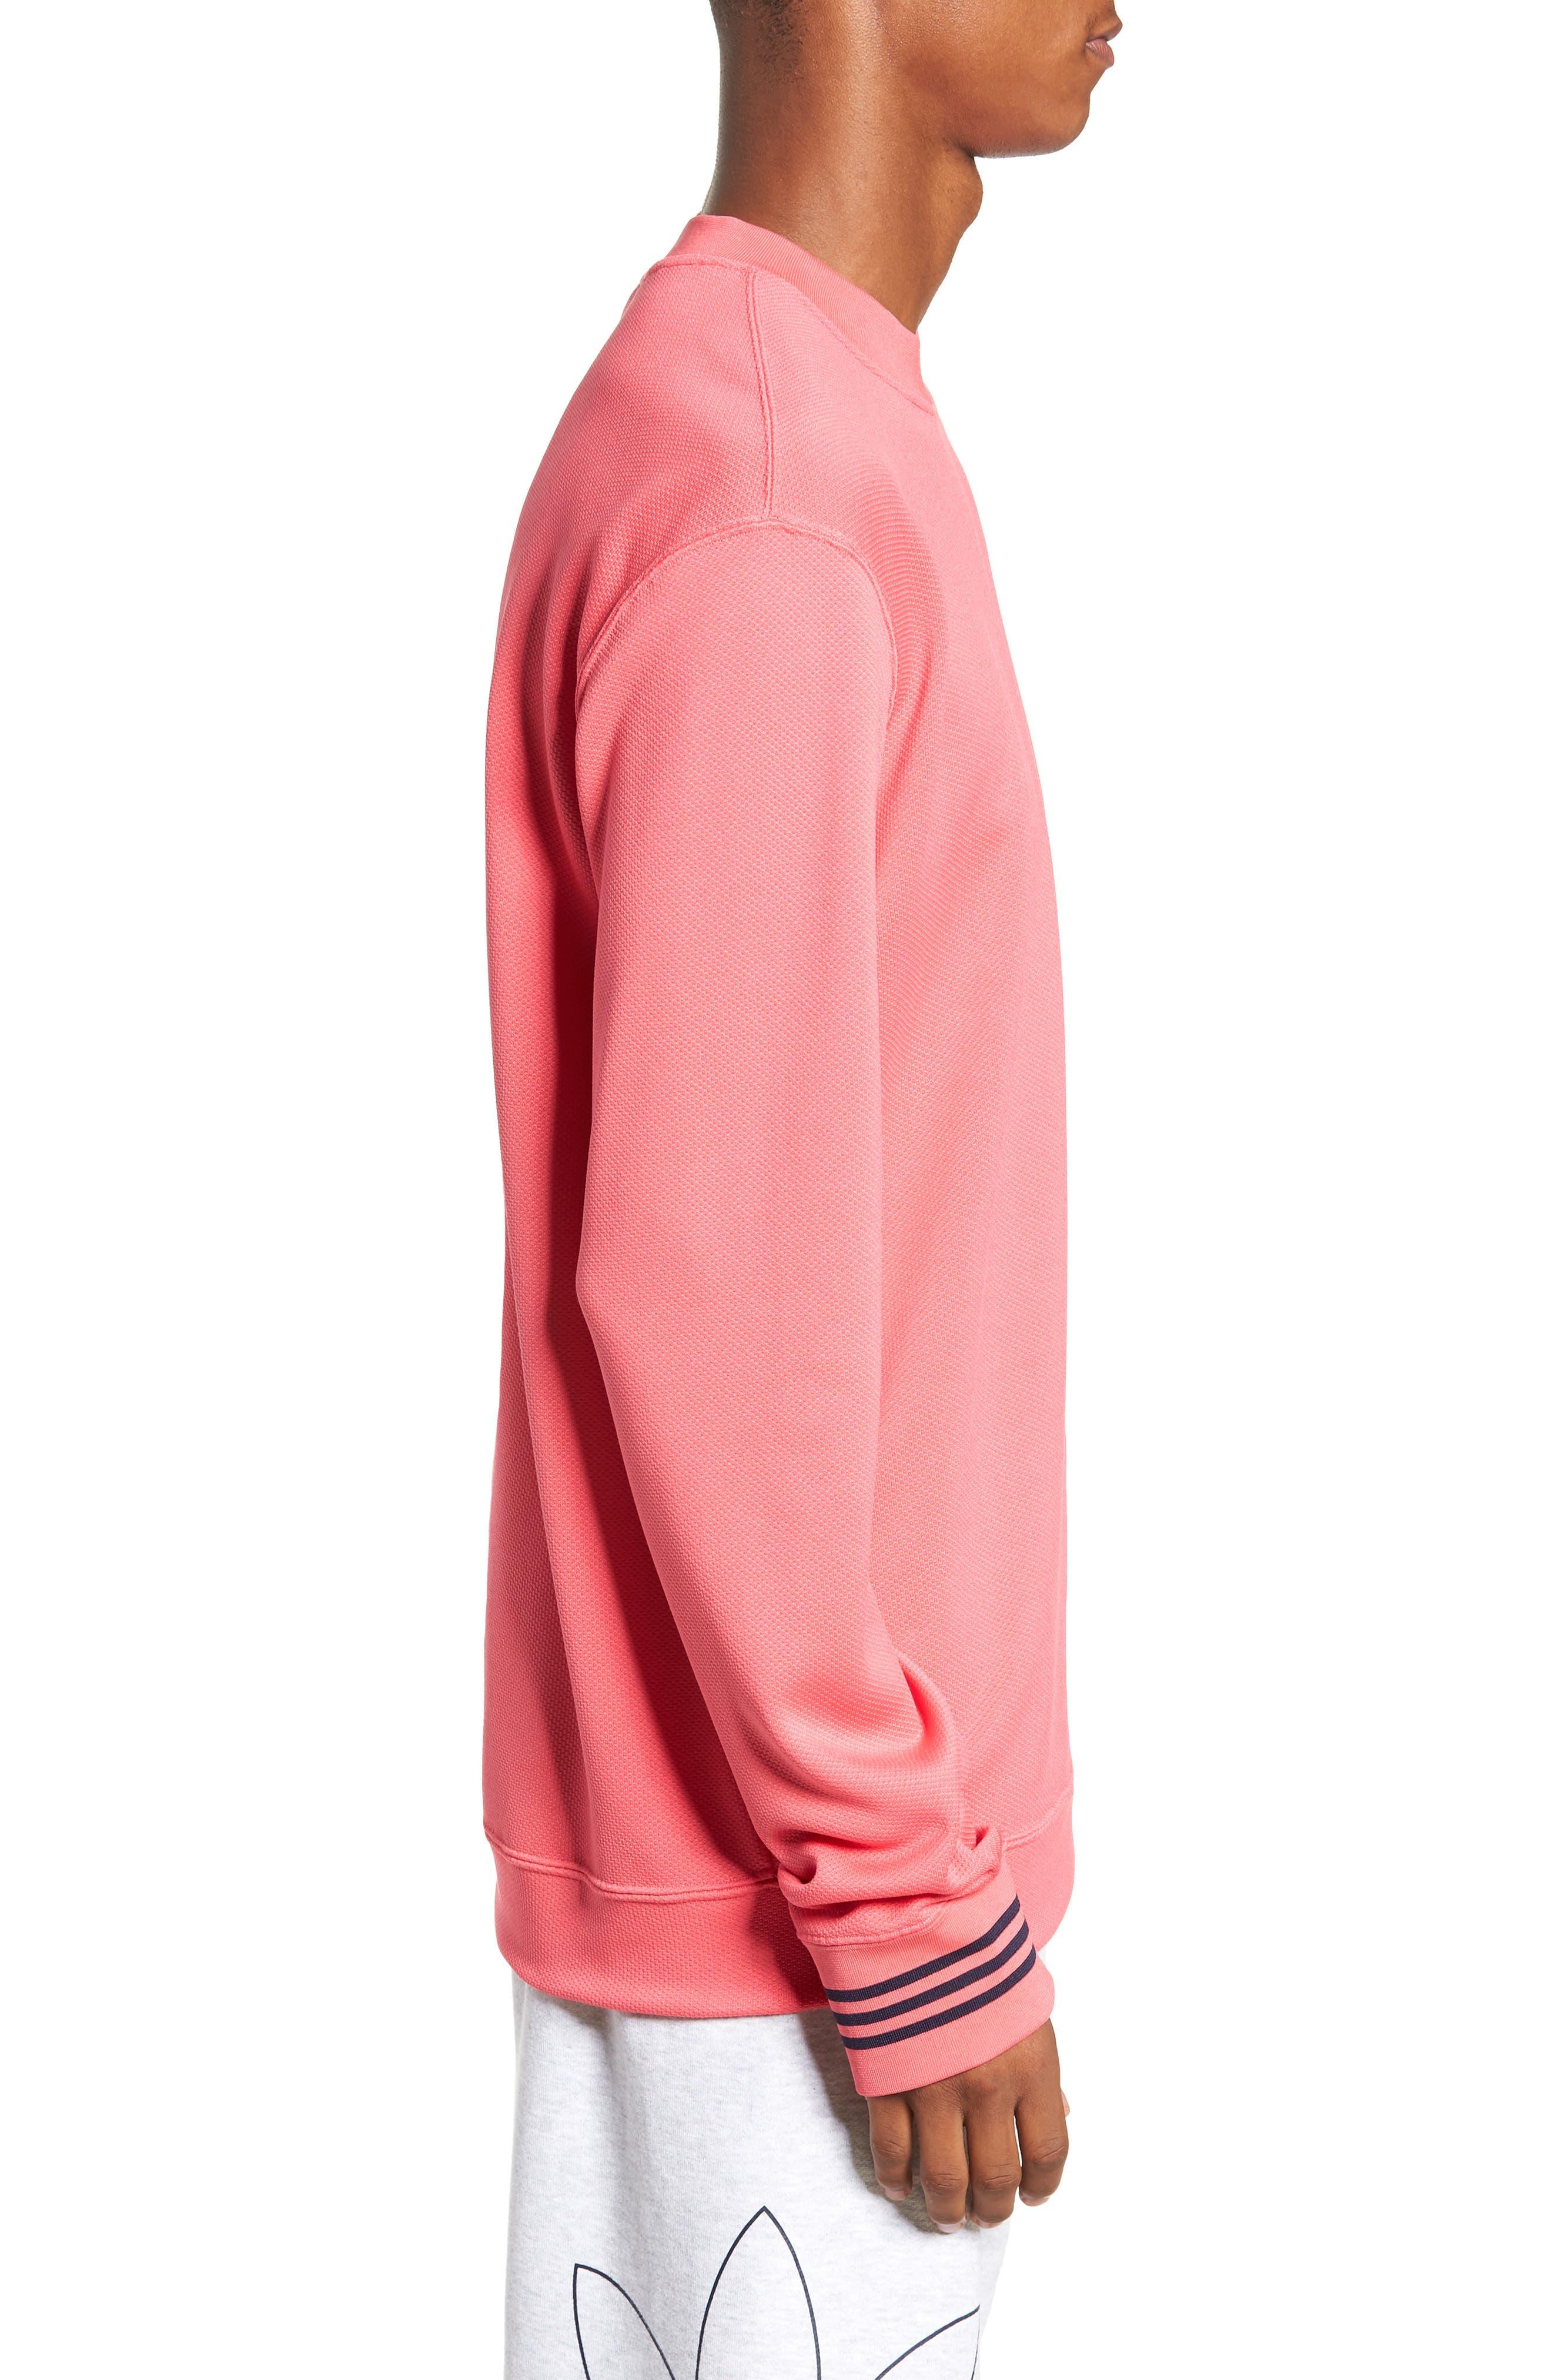 ADIDAS ORIGINALS, Piqué Long Sleeve T-Shirt, Alternate thumbnail 3, color, REAL PINK